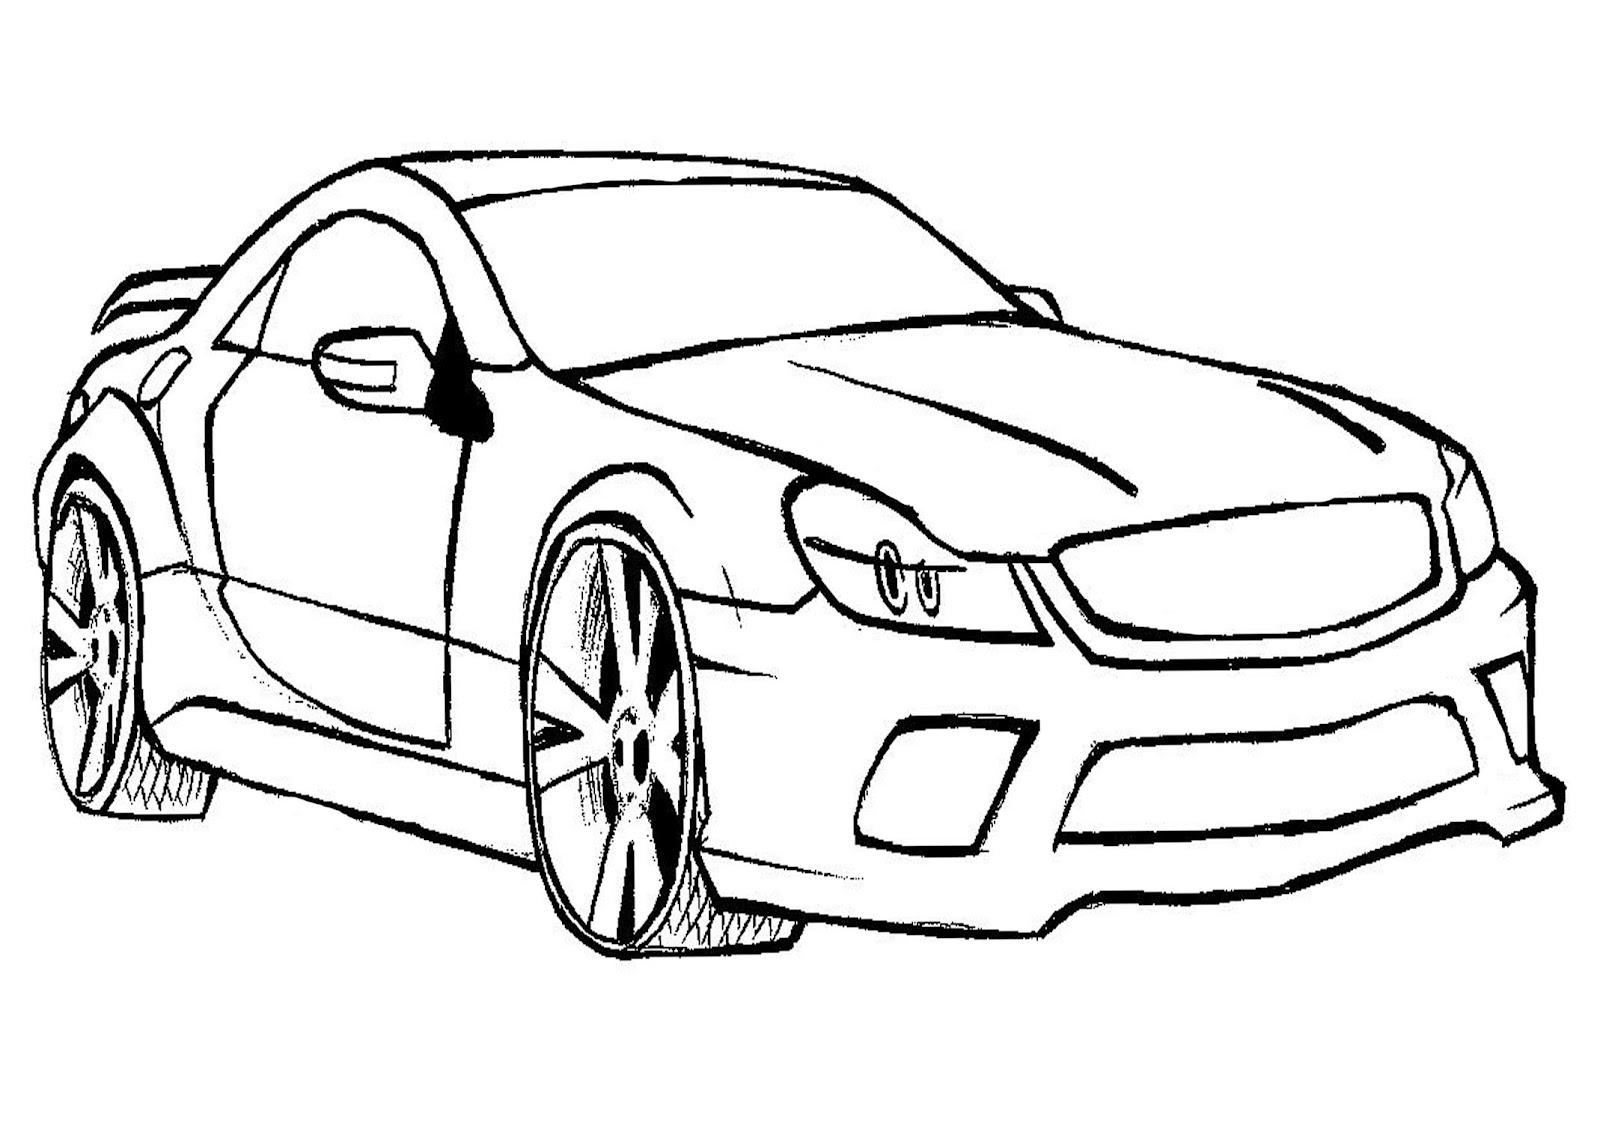 Desenhos de carros tunados, turbinados e hot wheels para